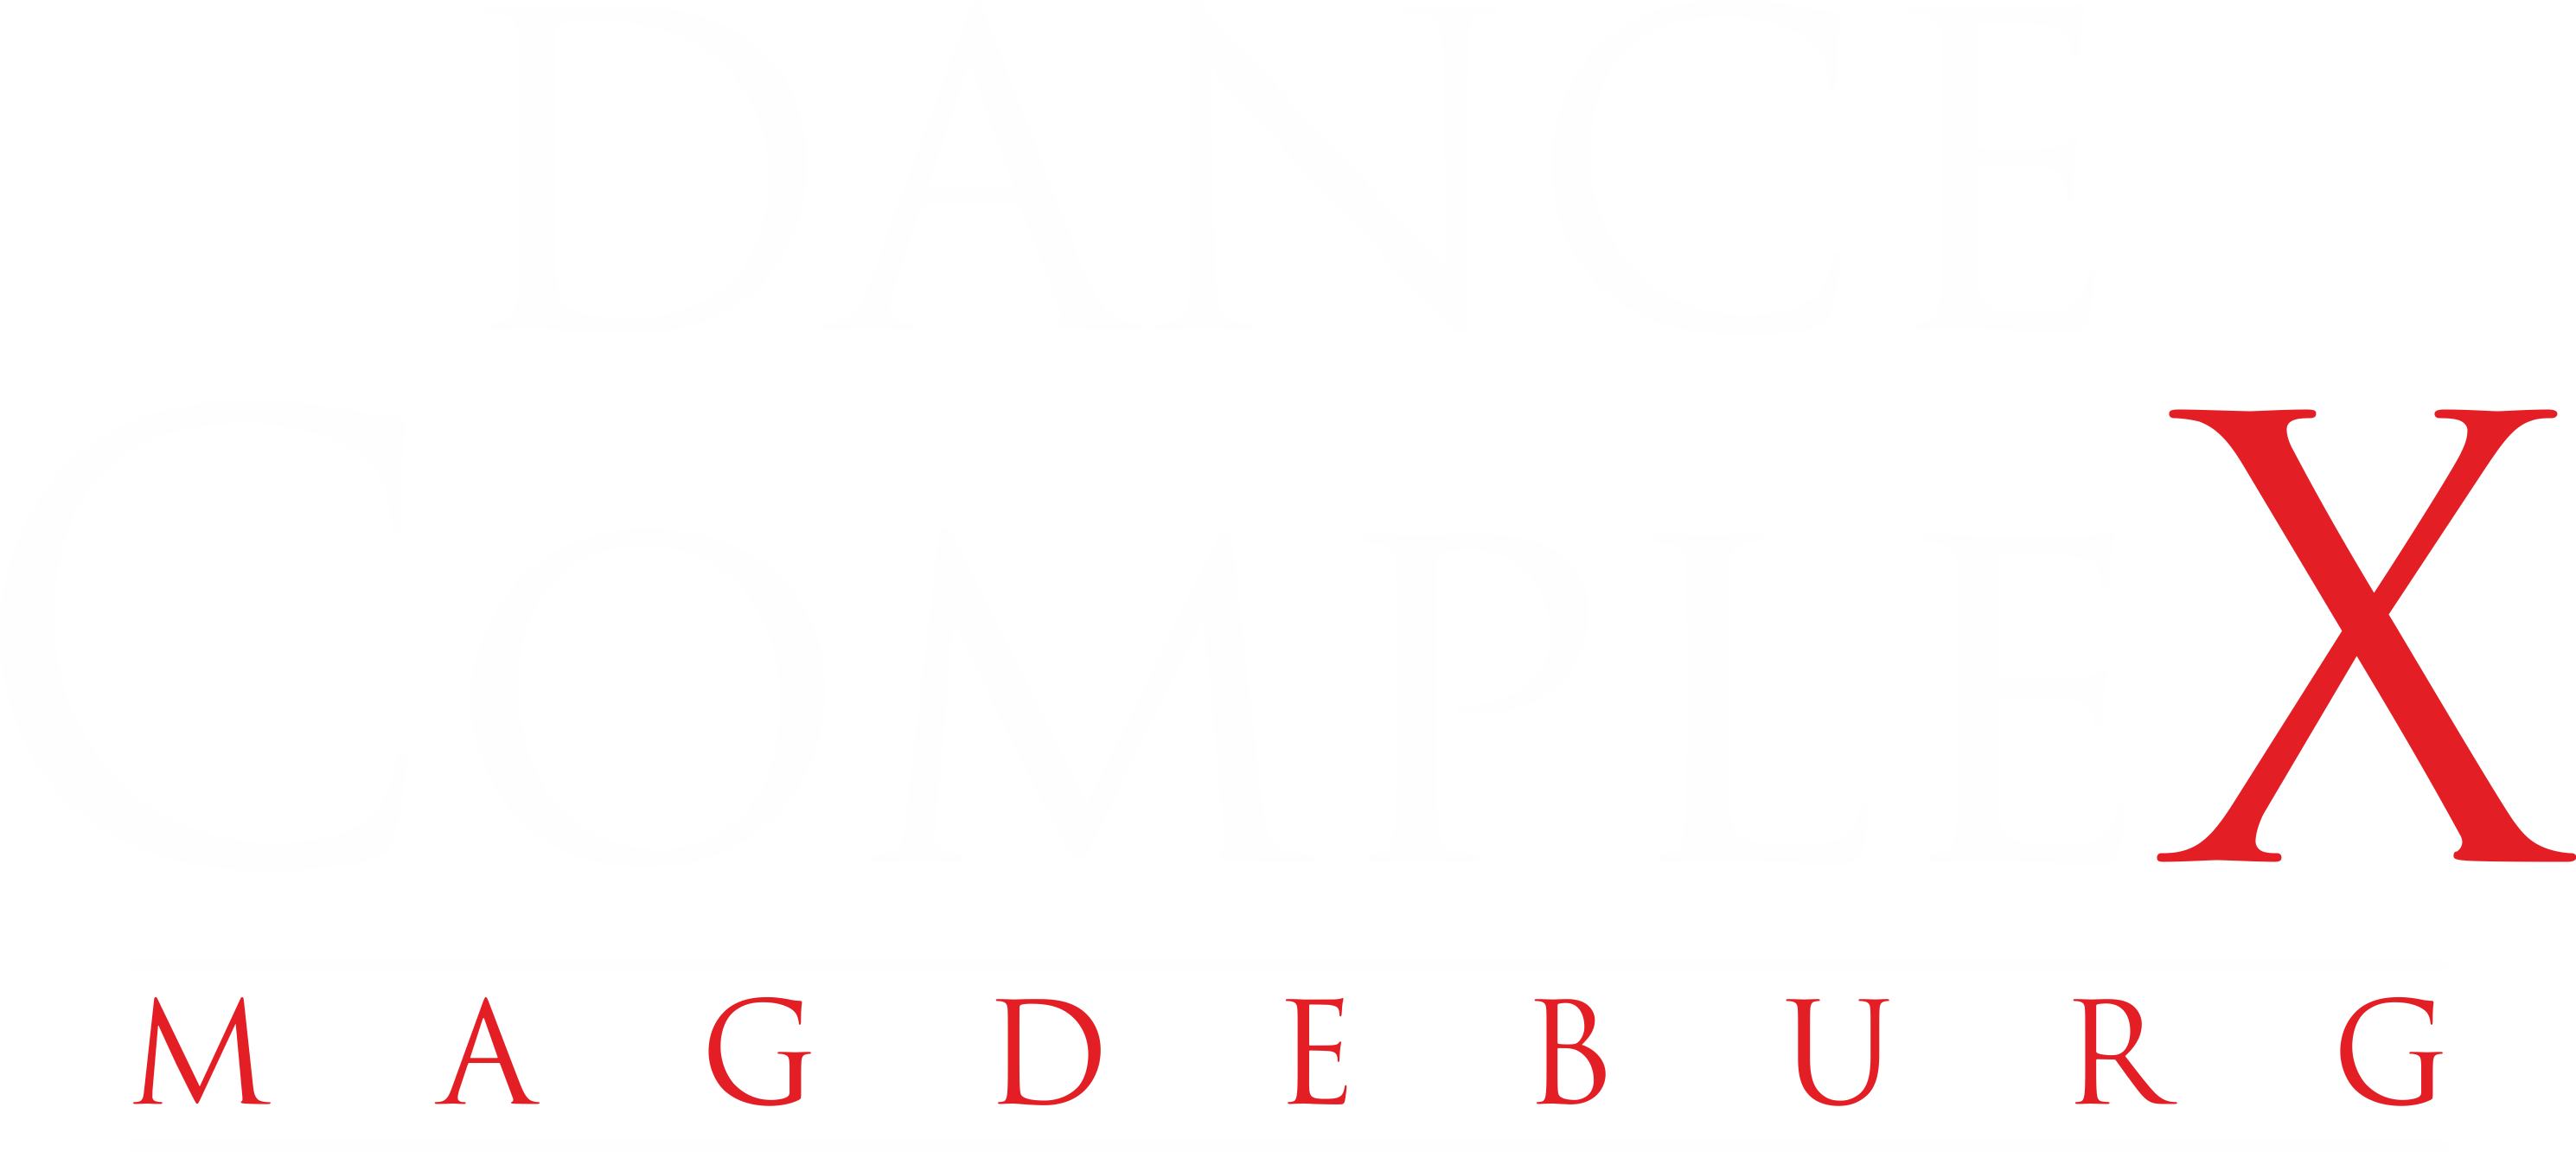 tanzschule dance complex caroline haase laura ulrich gbr. Black Bedroom Furniture Sets. Home Design Ideas